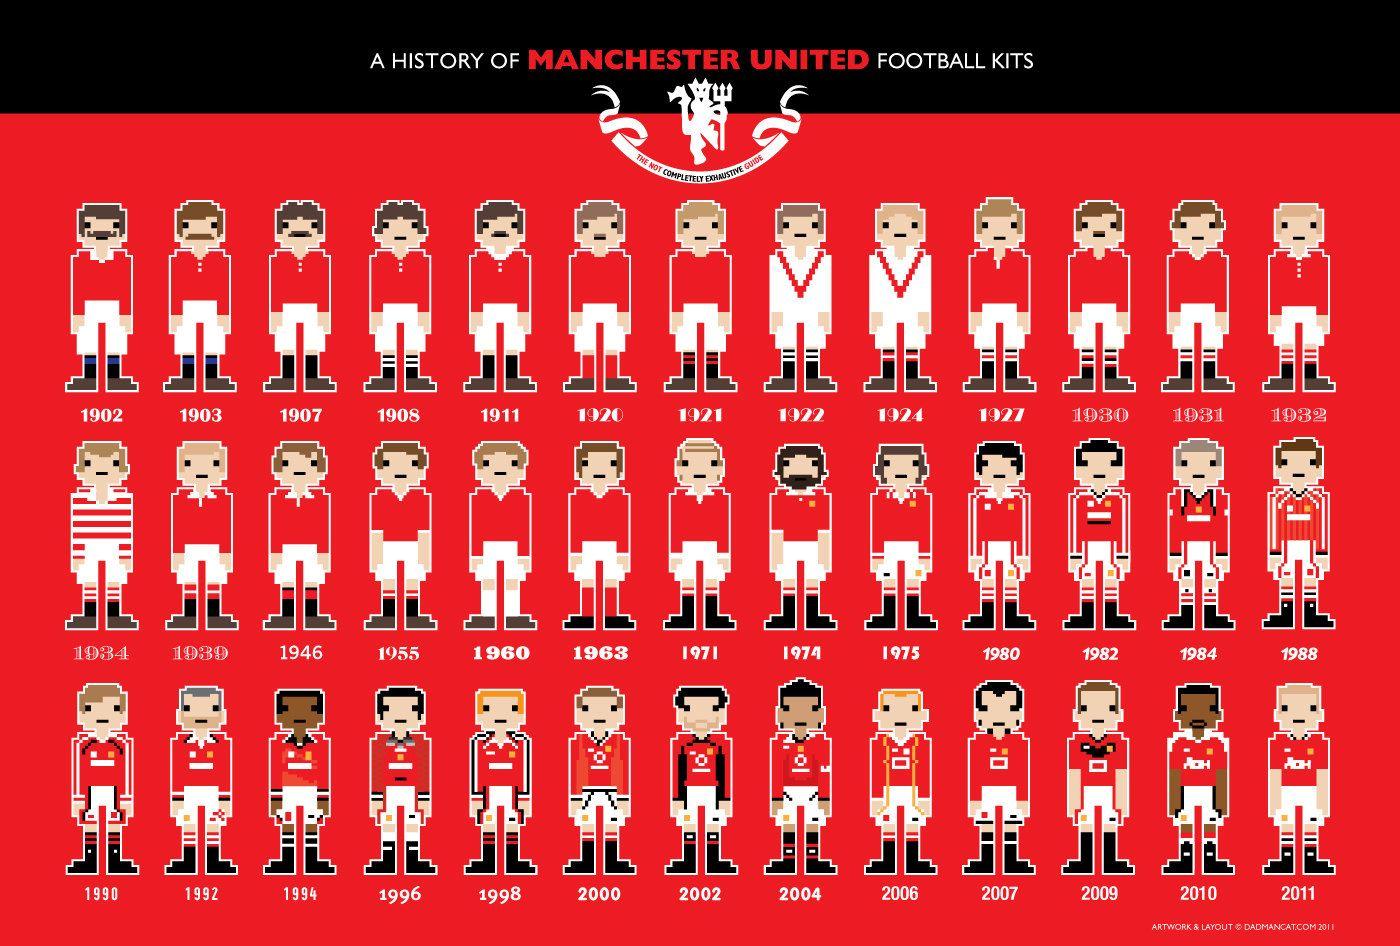 Maentʃɛstər Manchester United History Of Kits Manchester United Football Kit Manchester United Manchester United Football